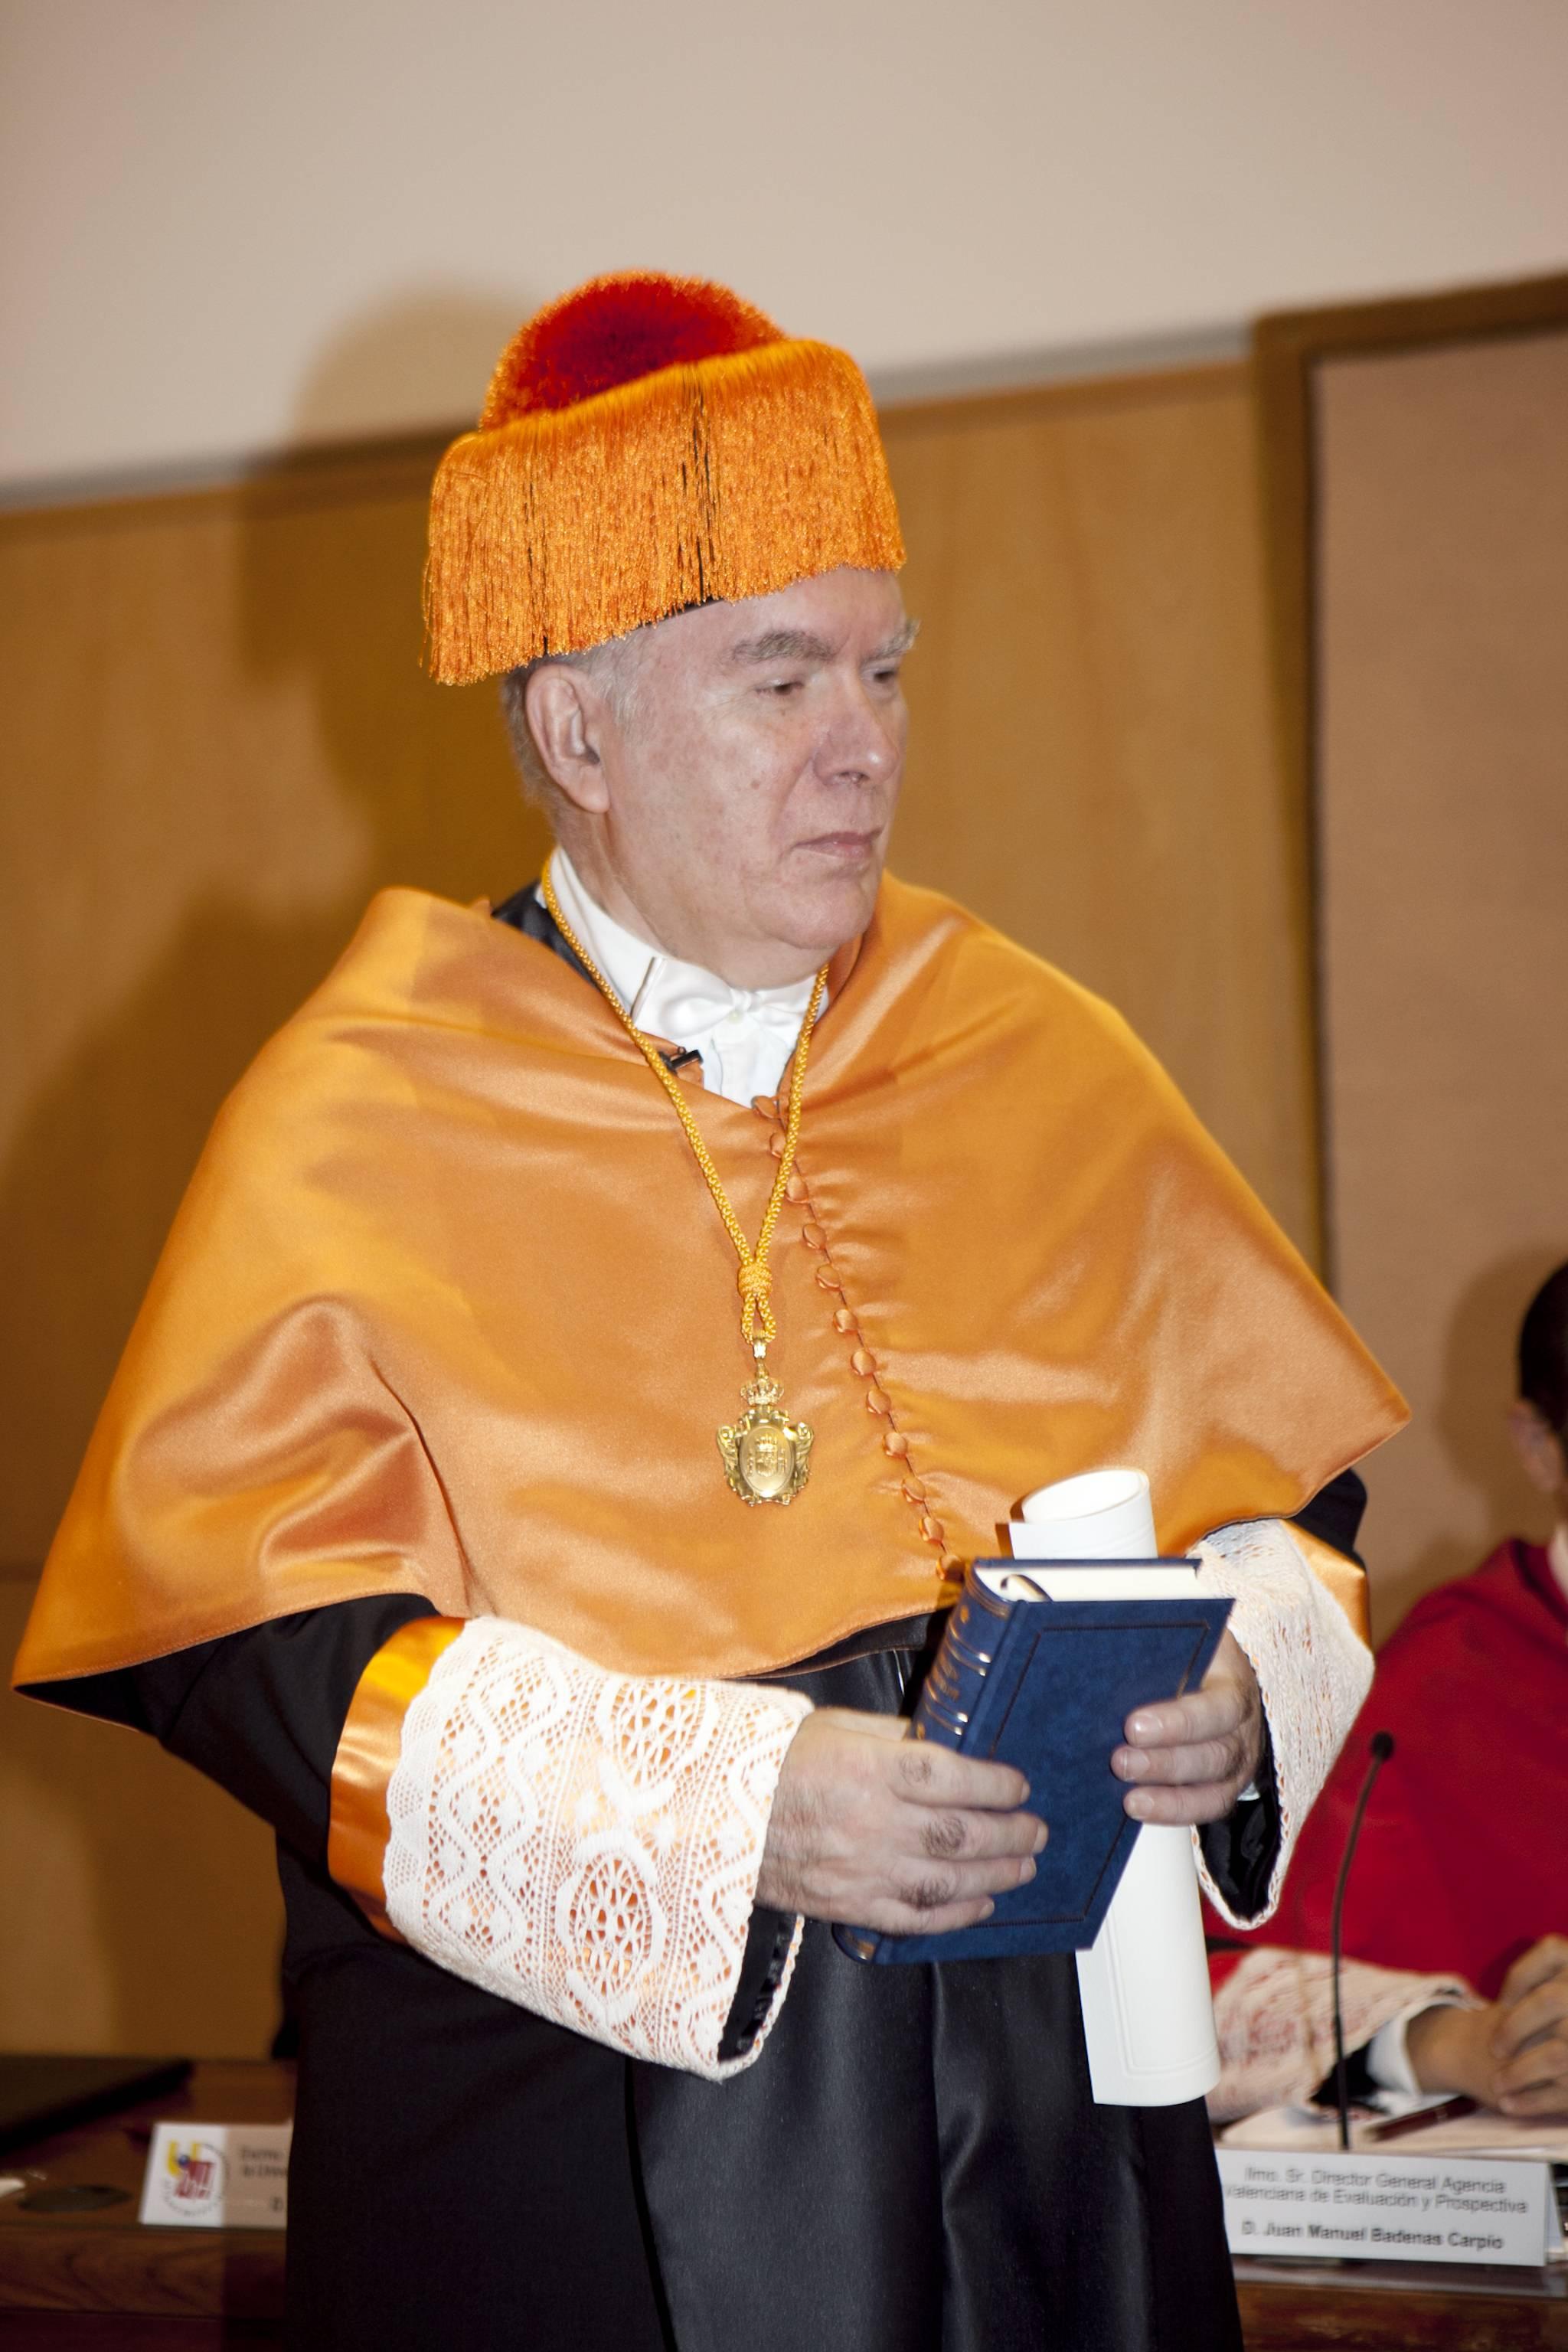 doctor-honoris-causa-luis-gamir_mg_0766.jpg